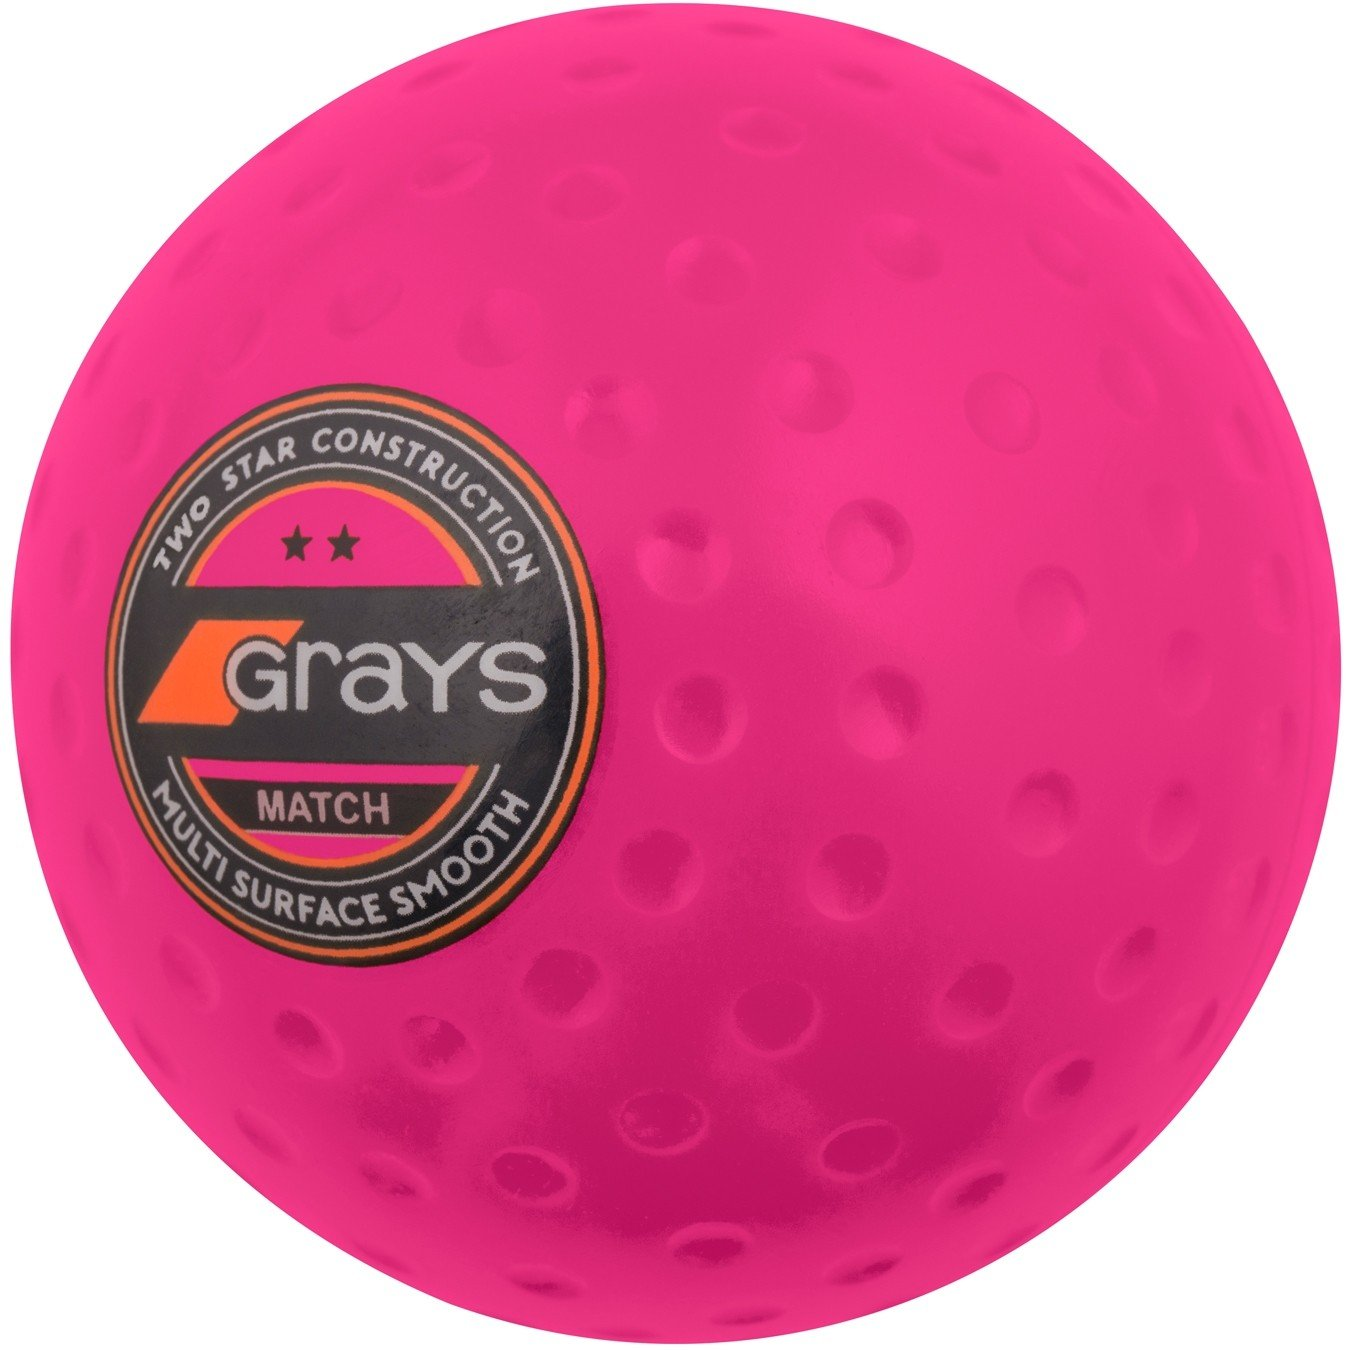 Grays Match Hockey Ball - Pink